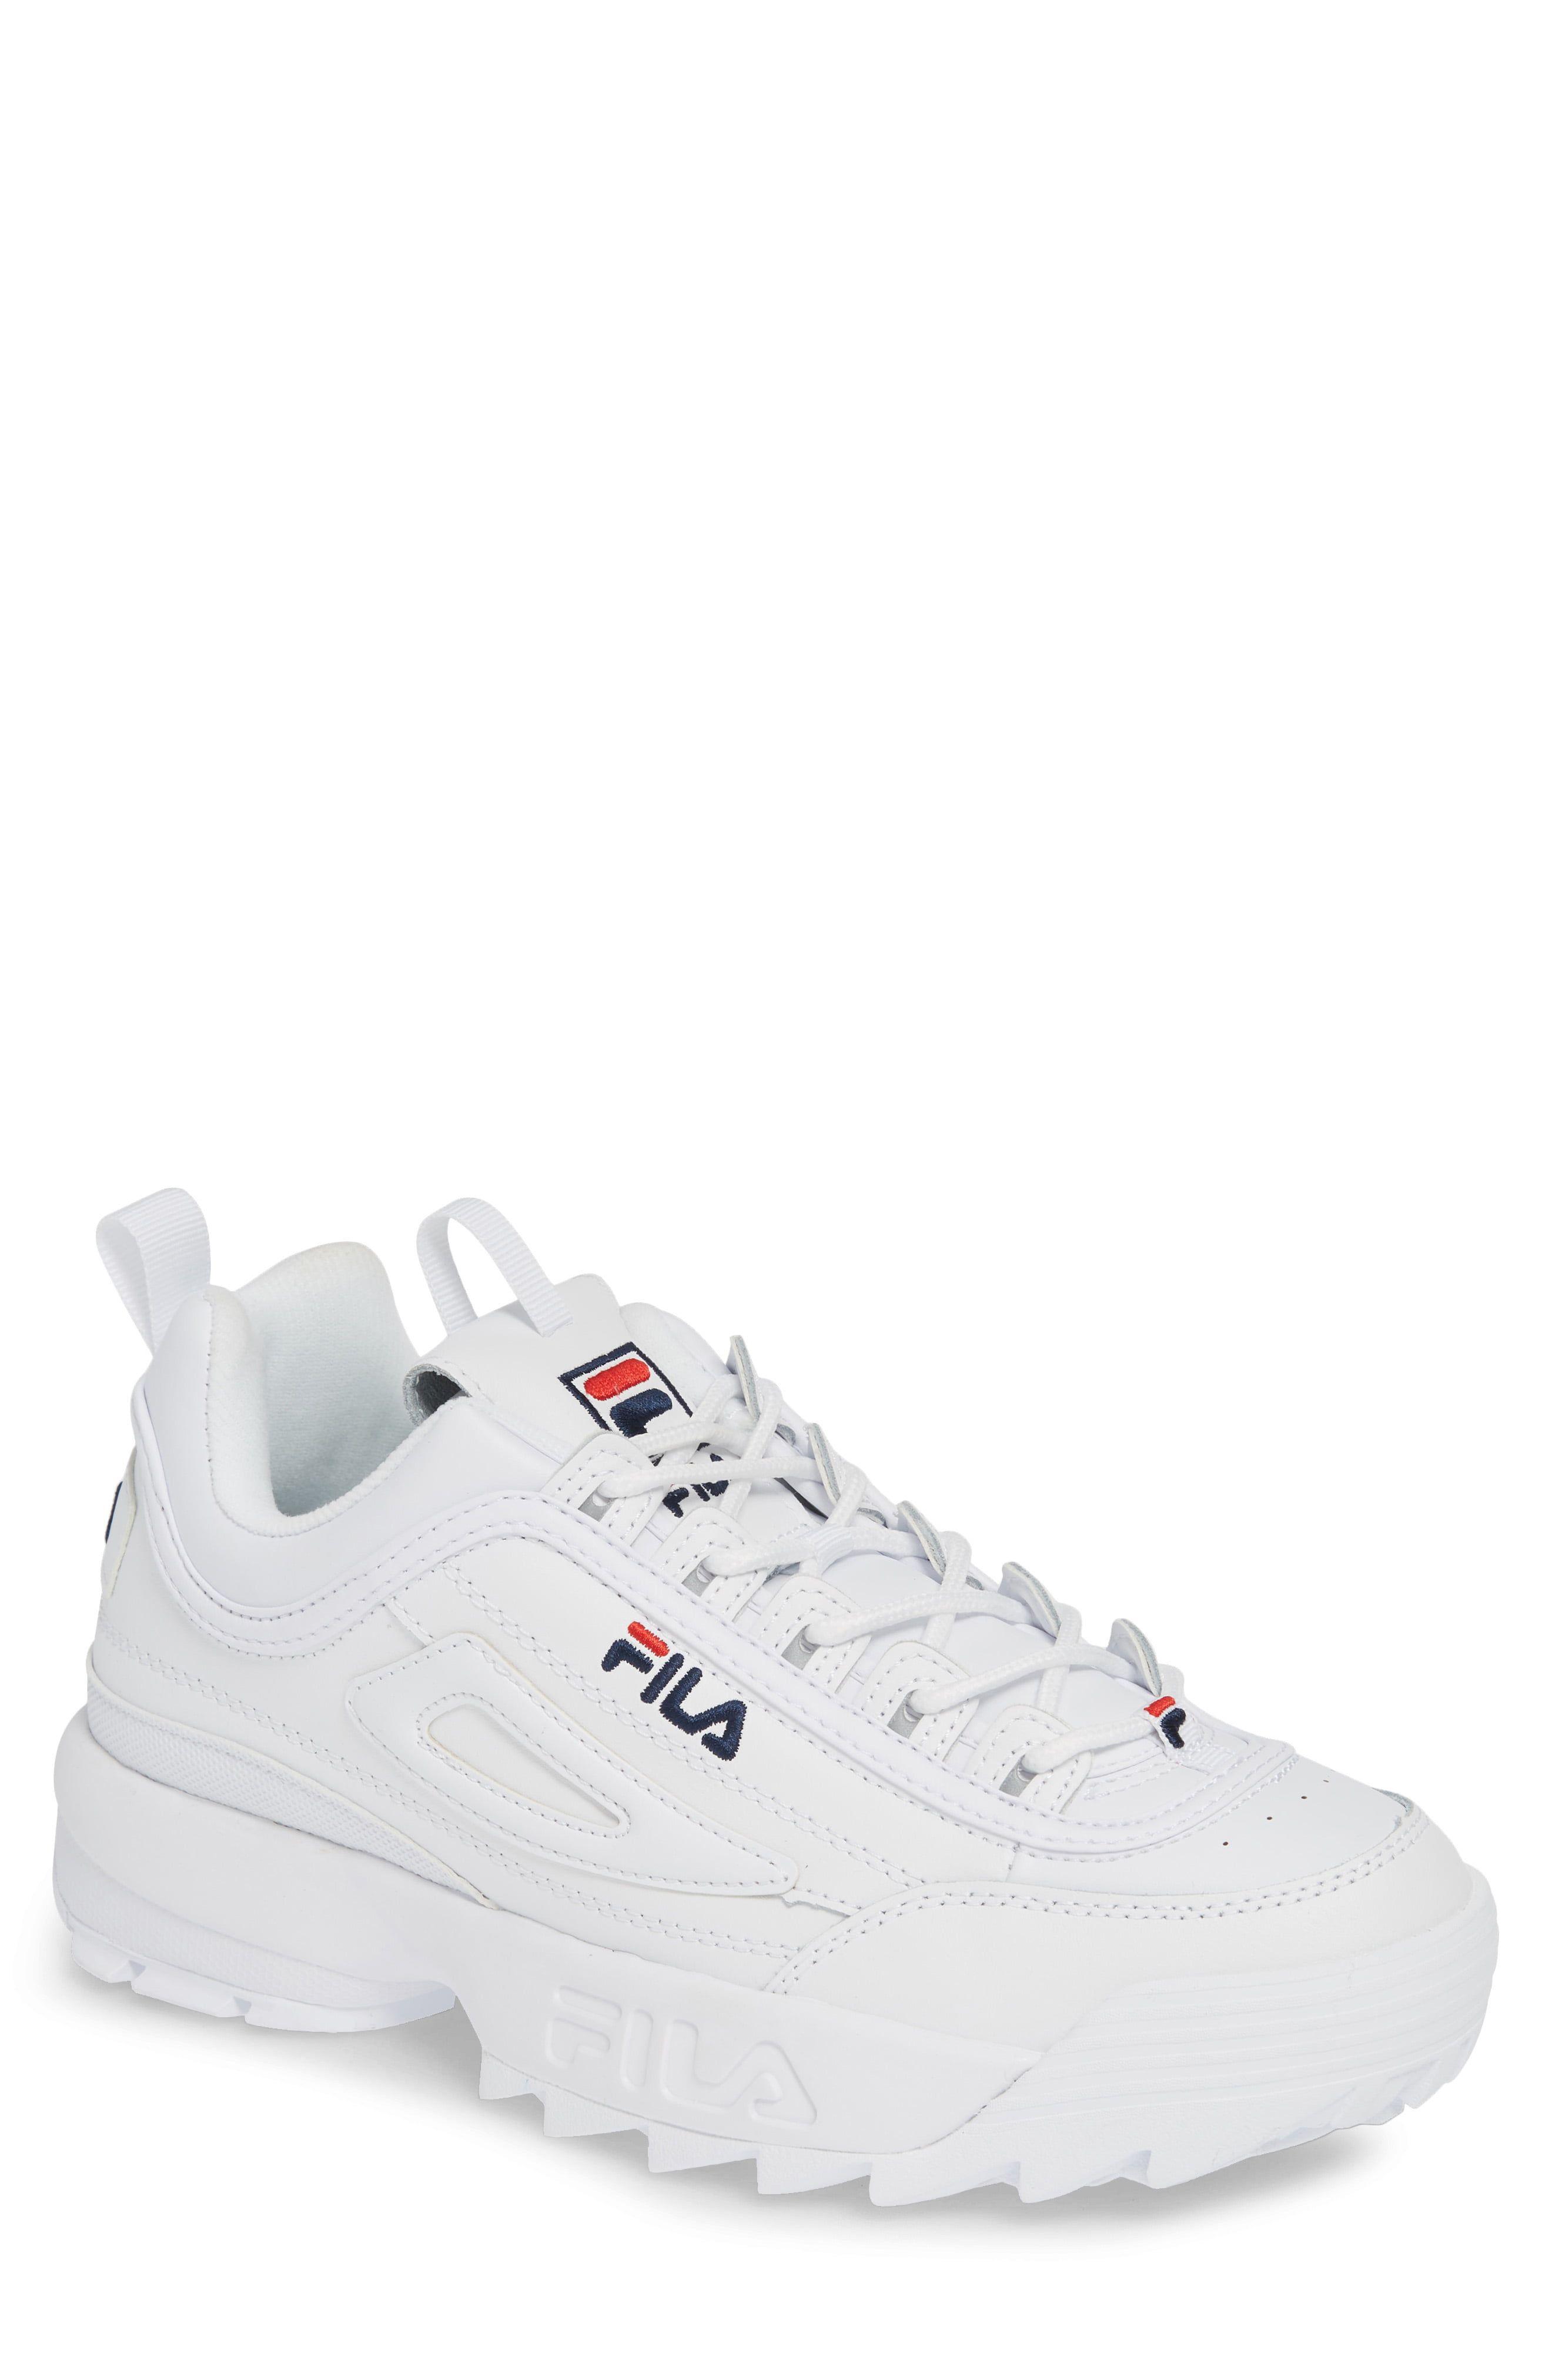 FILA Disruptor II Premium Sneaker (Men | Sneakers, Latest shoes